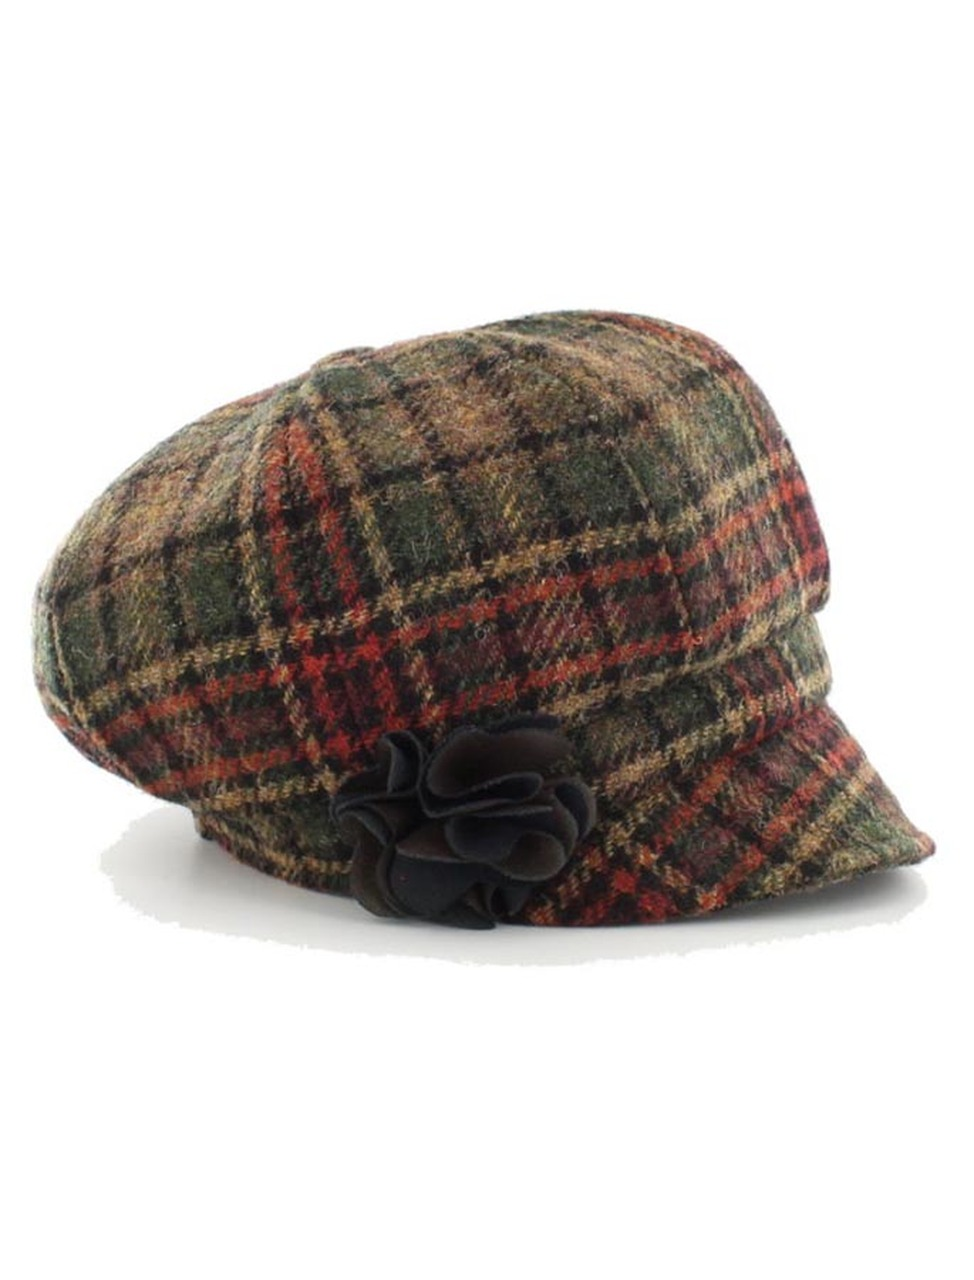 7bb16b306 Ladies Tweed Newsboy Hat - Green Rust Plaid